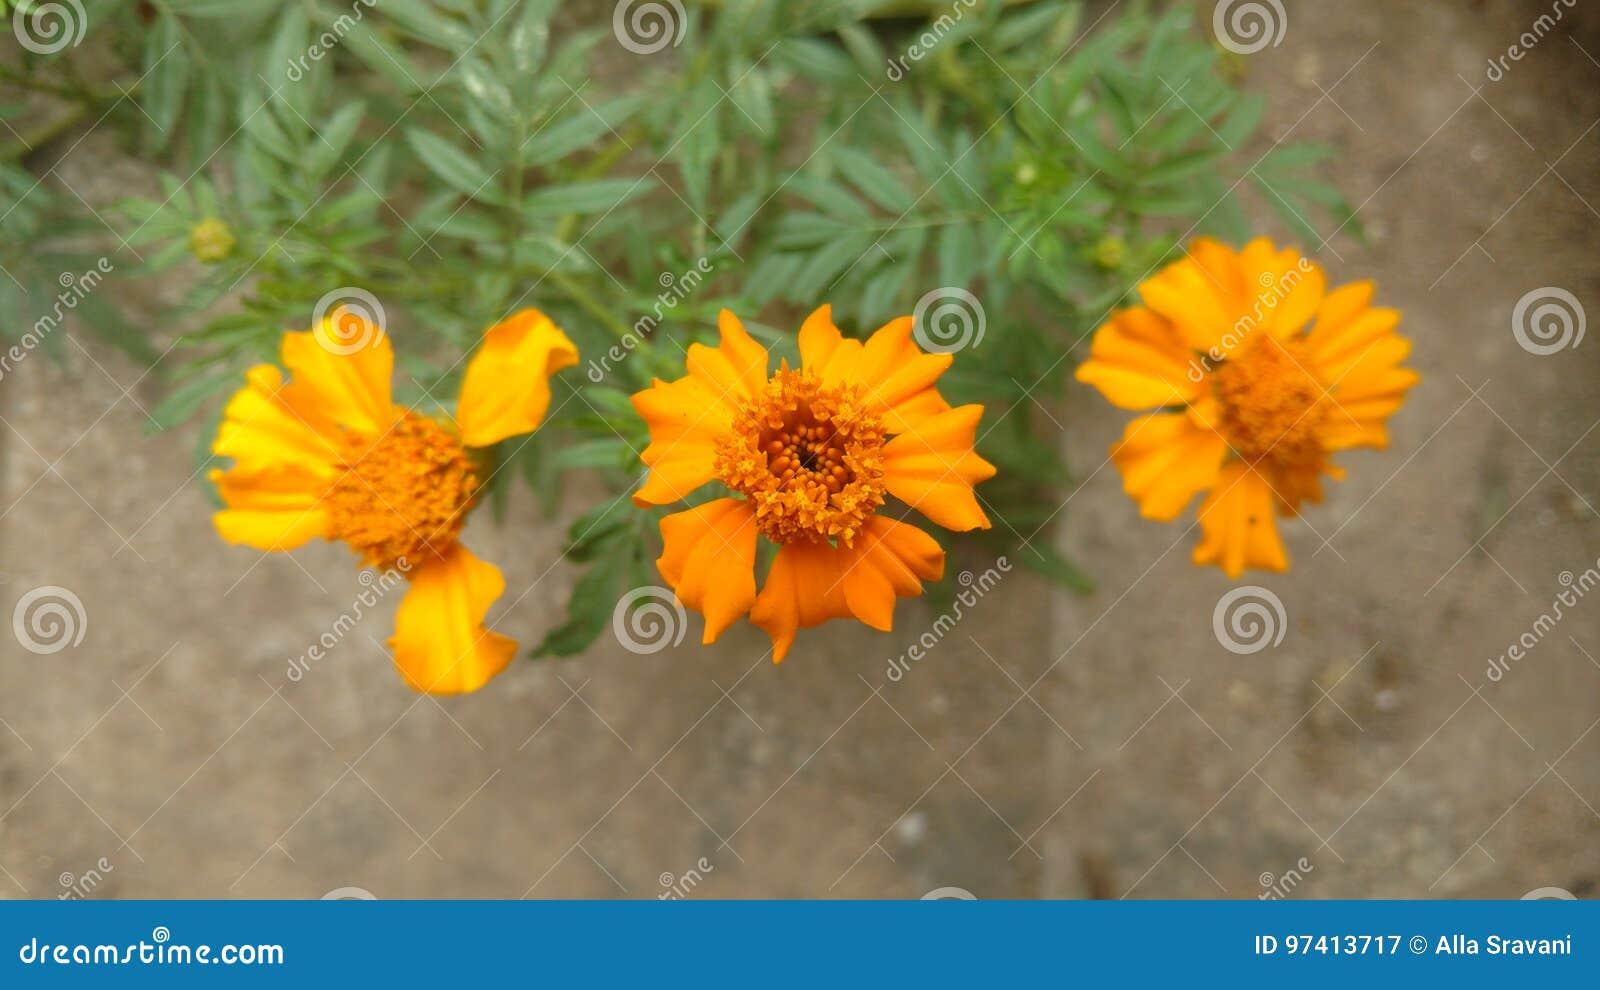 Marigold Flower Stock Image Image Of Orange Flower 97413717